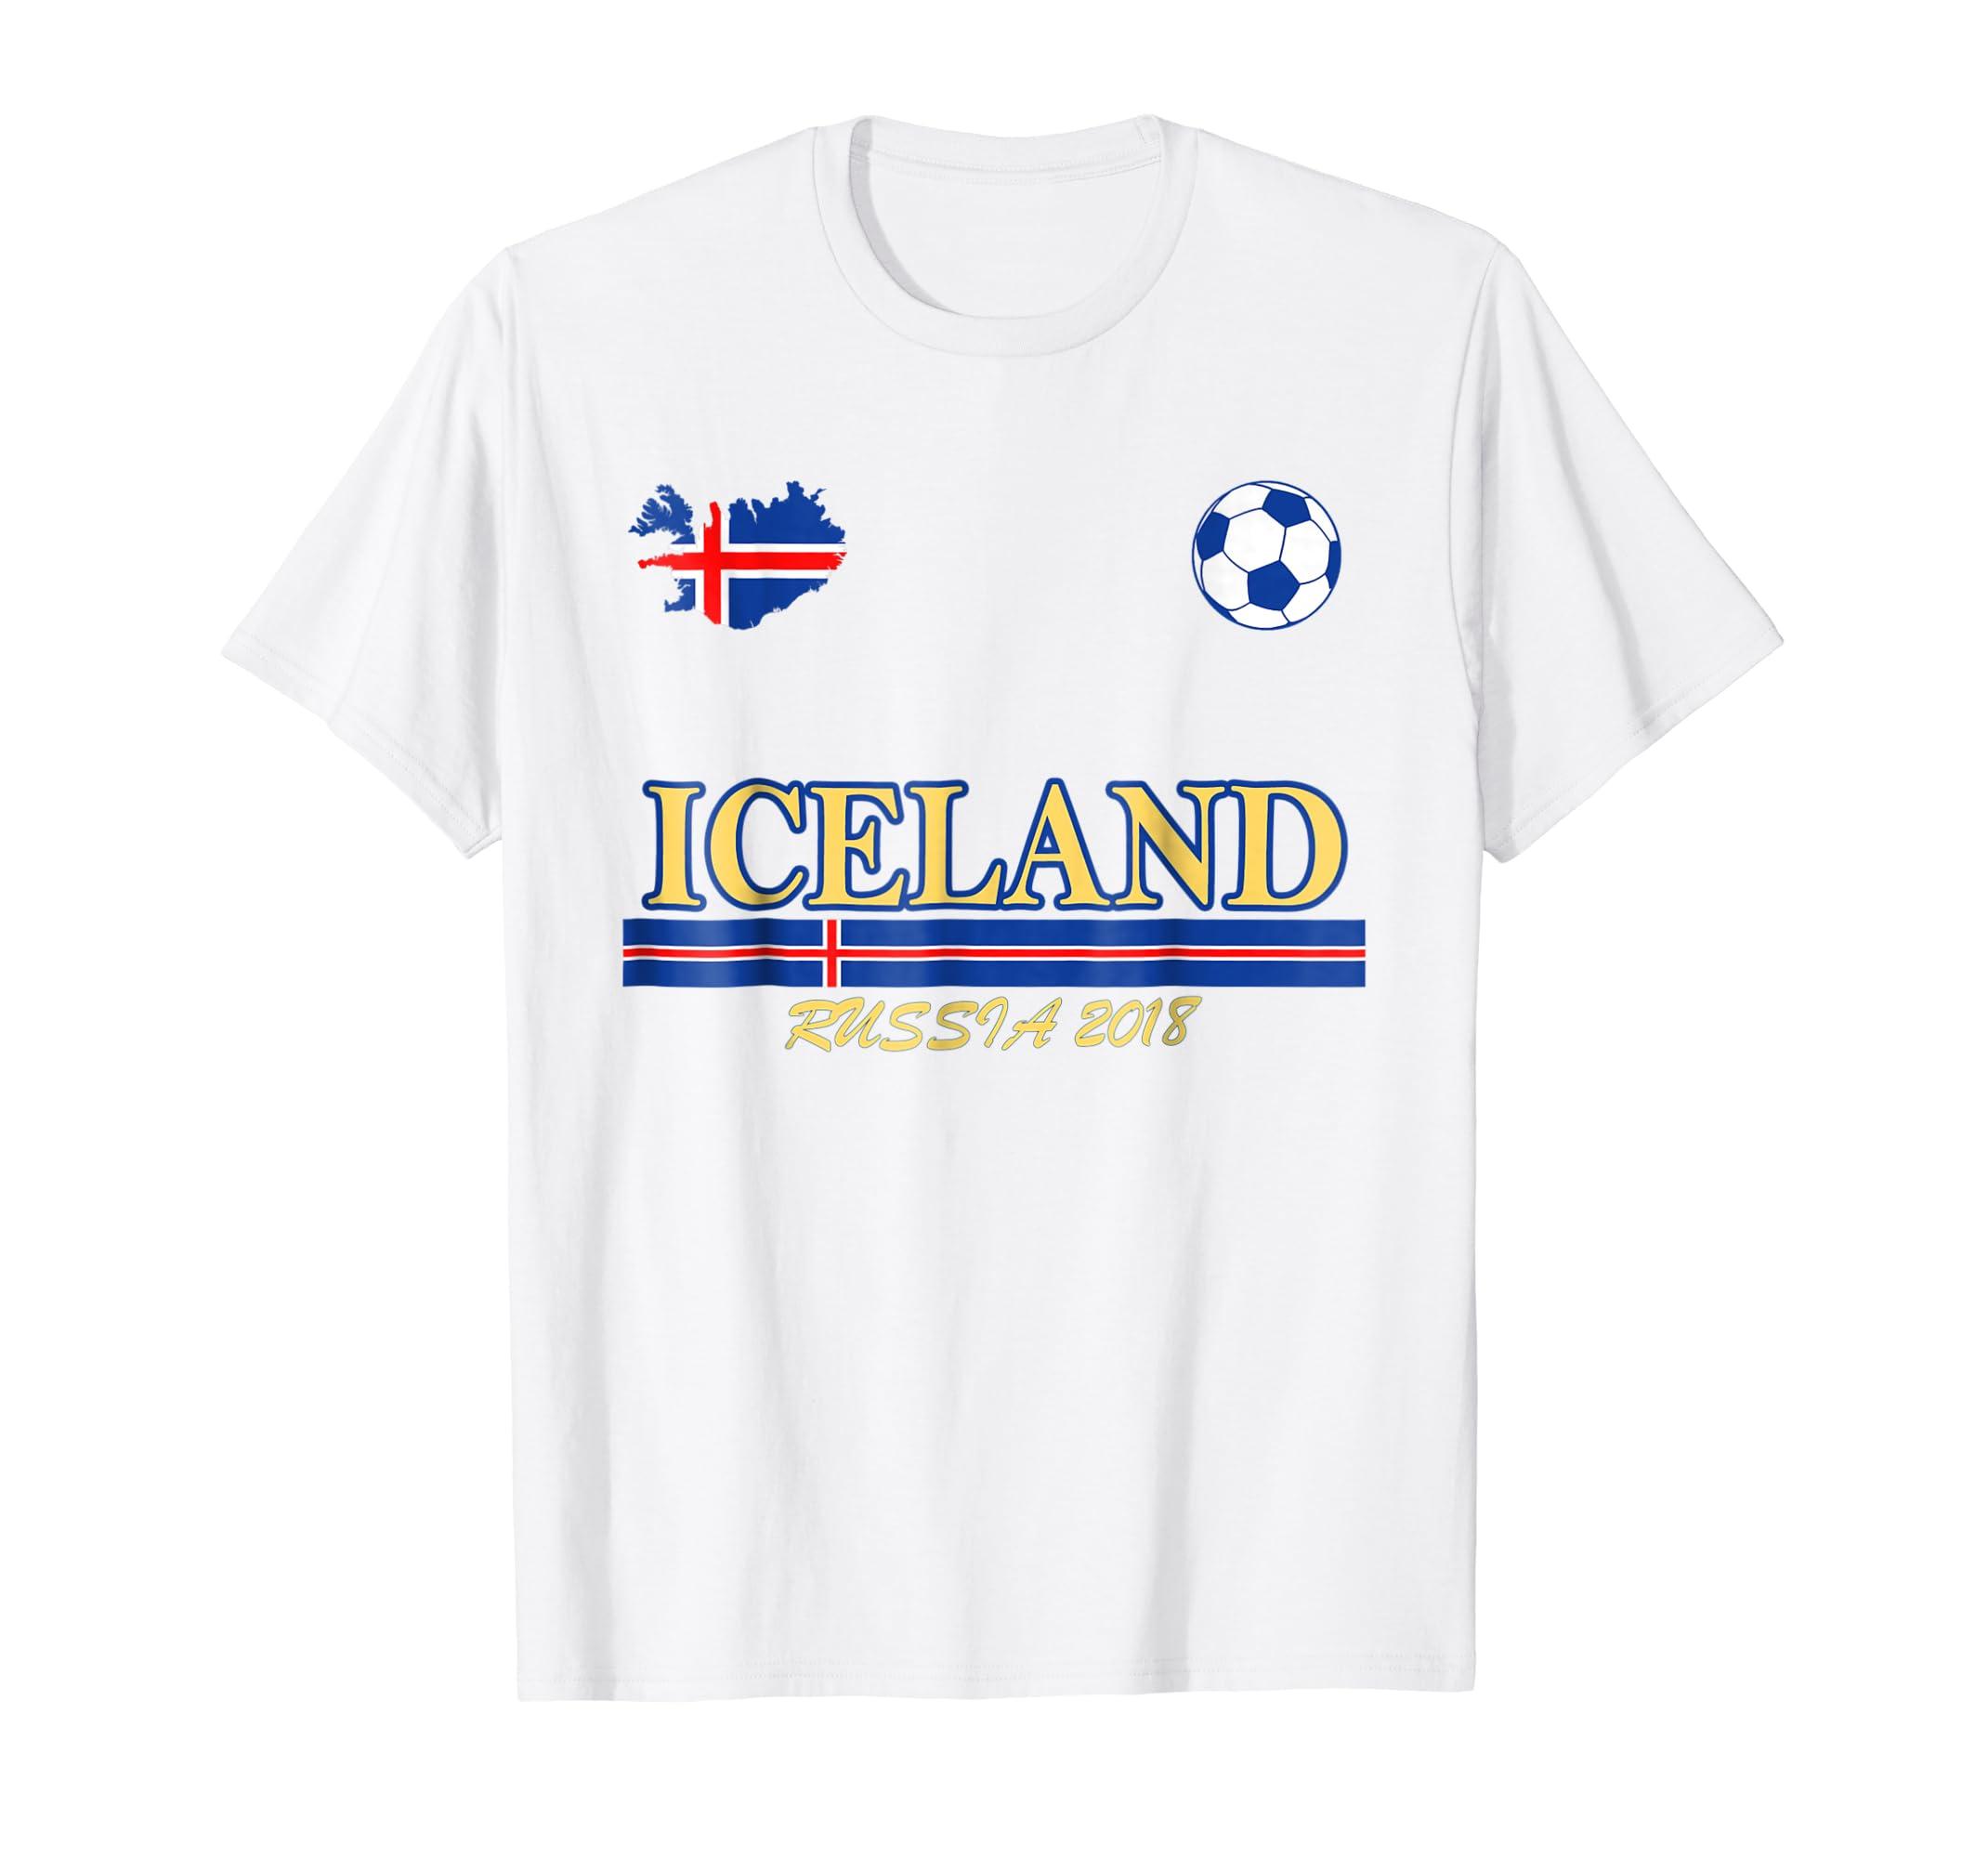 a14cec87c32 Iceland Soccer Jersey World Cup - Nils Stucki Kieferorthopäde